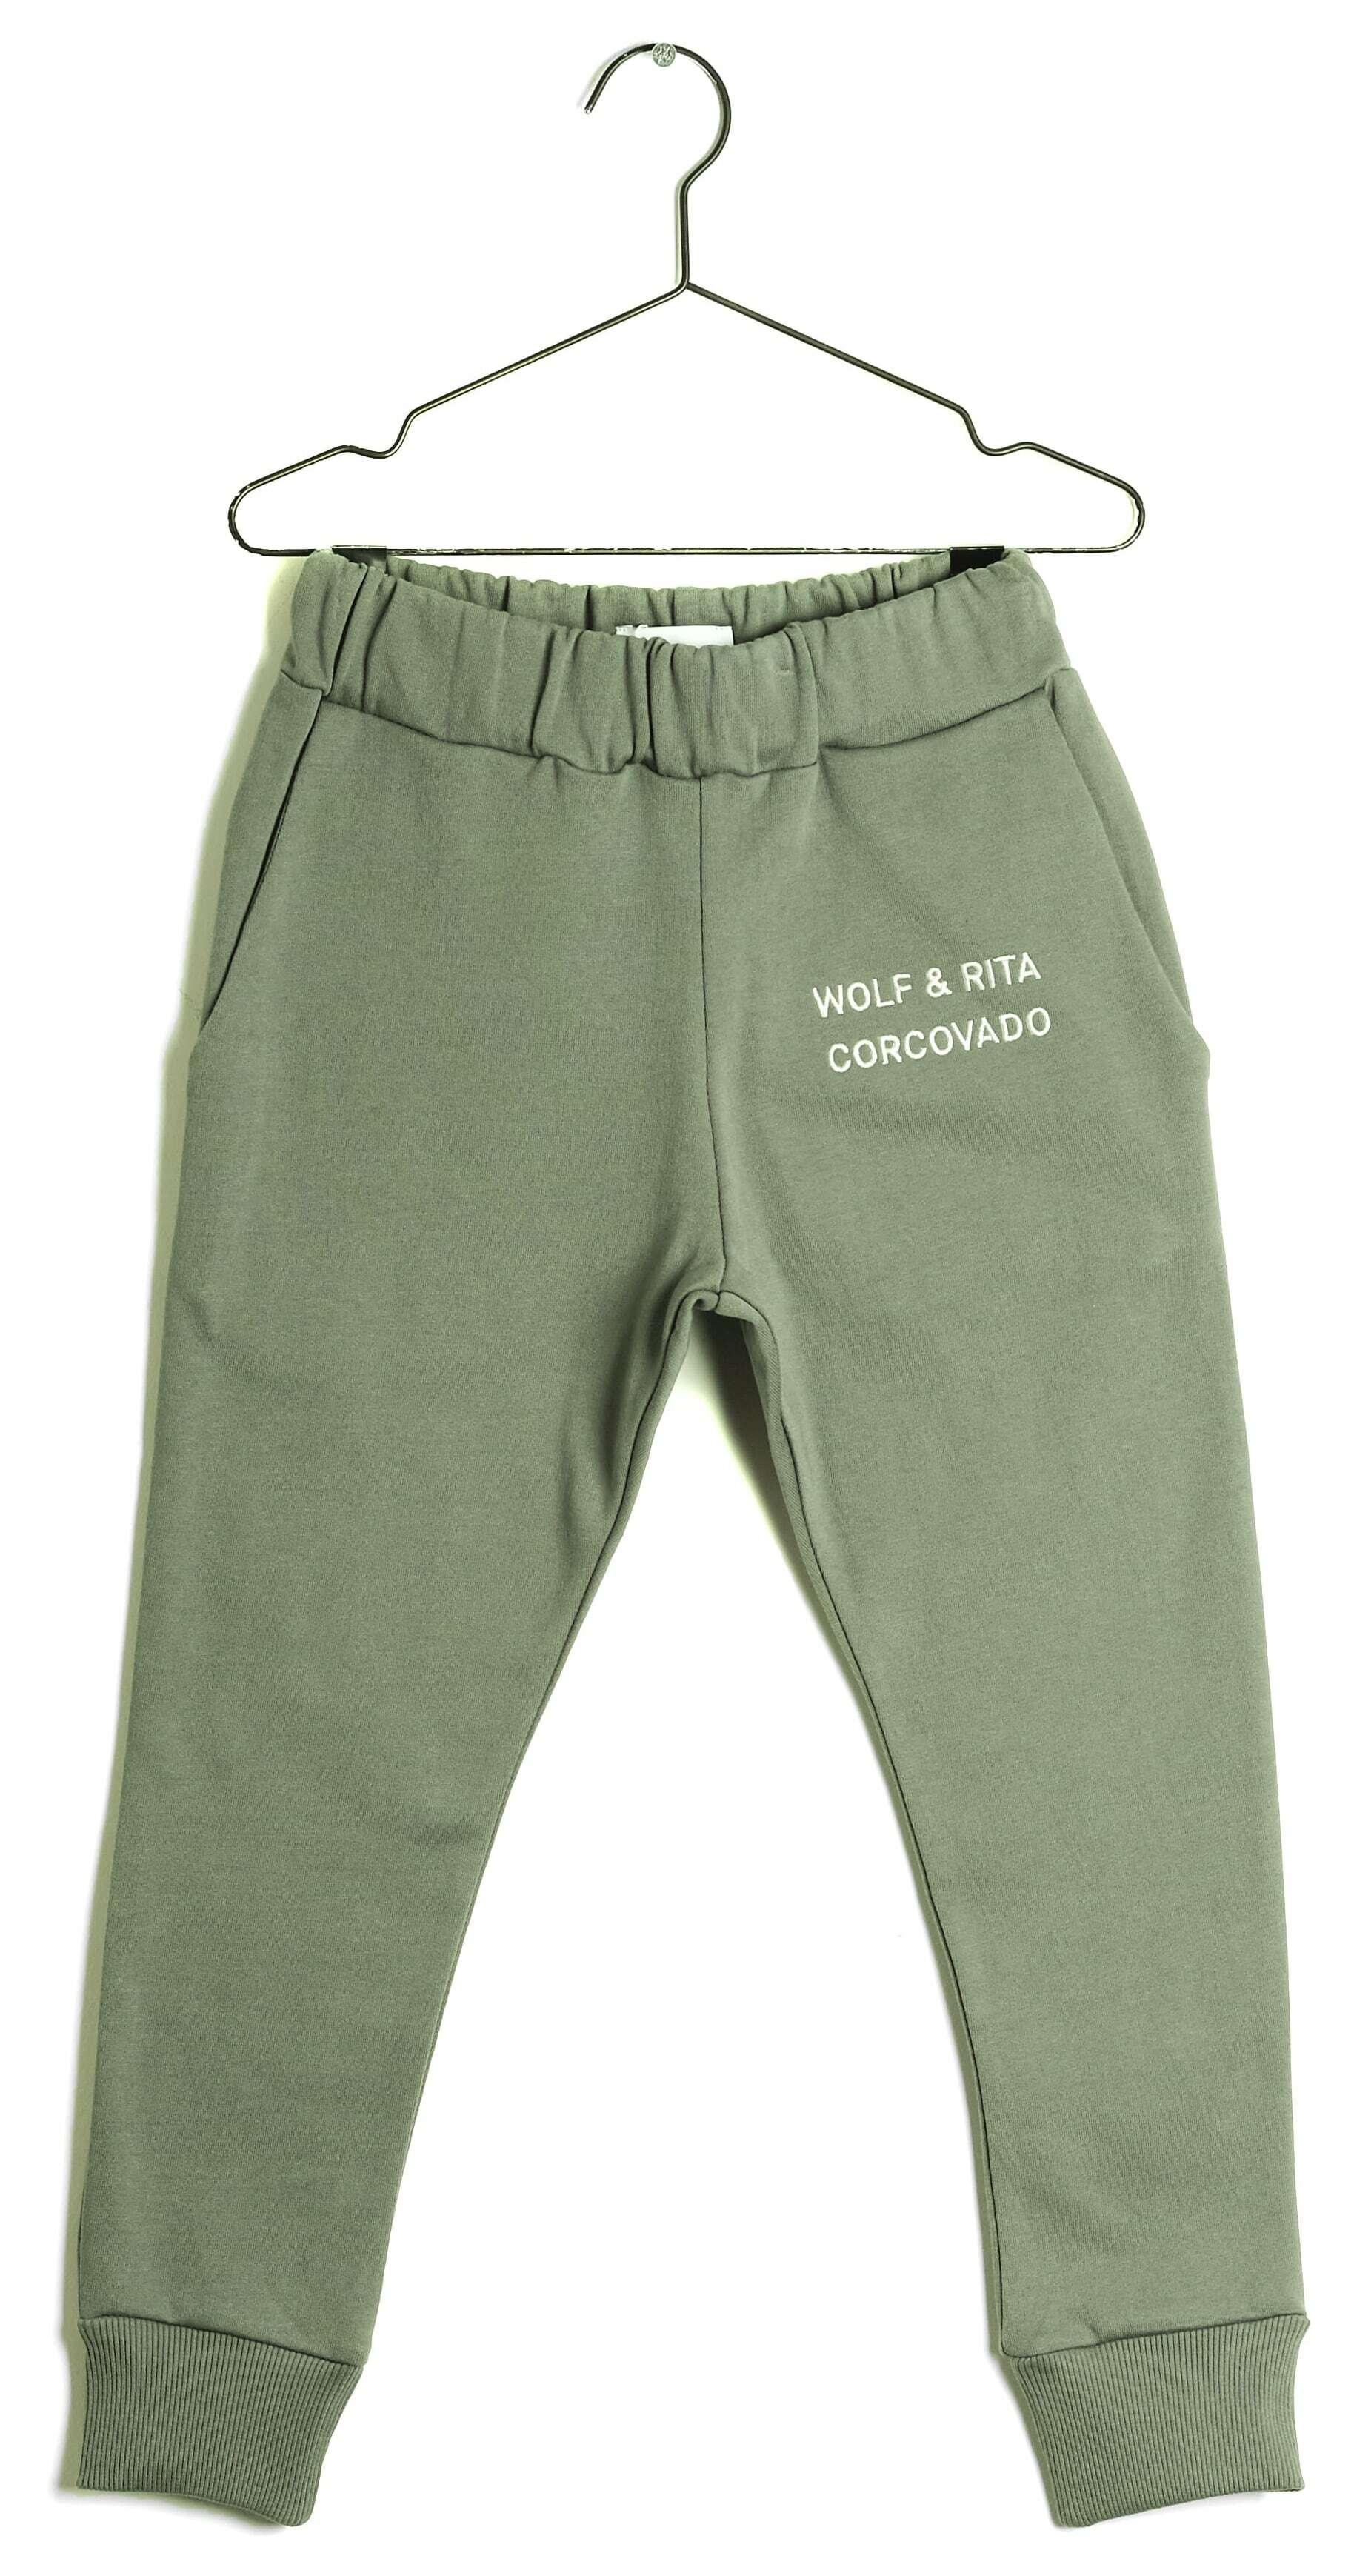 《WOLF & RITA 2019AW》AMADEU trousers / Corcovado